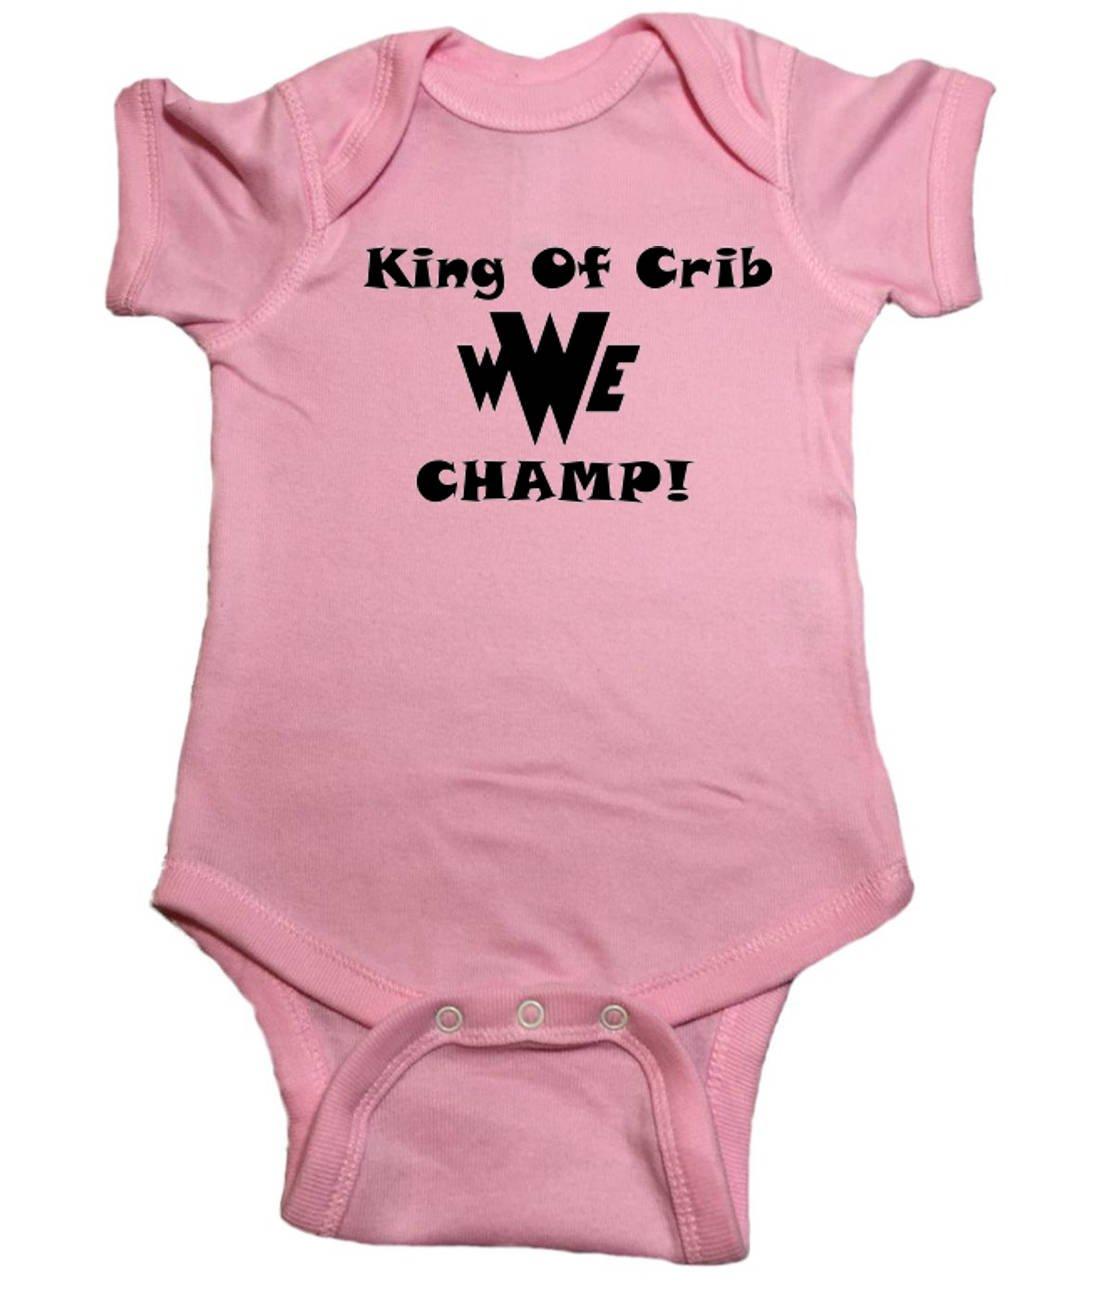 WWE Wrestling King of Crib Champ Bodysuit (24 Months) by QLShops